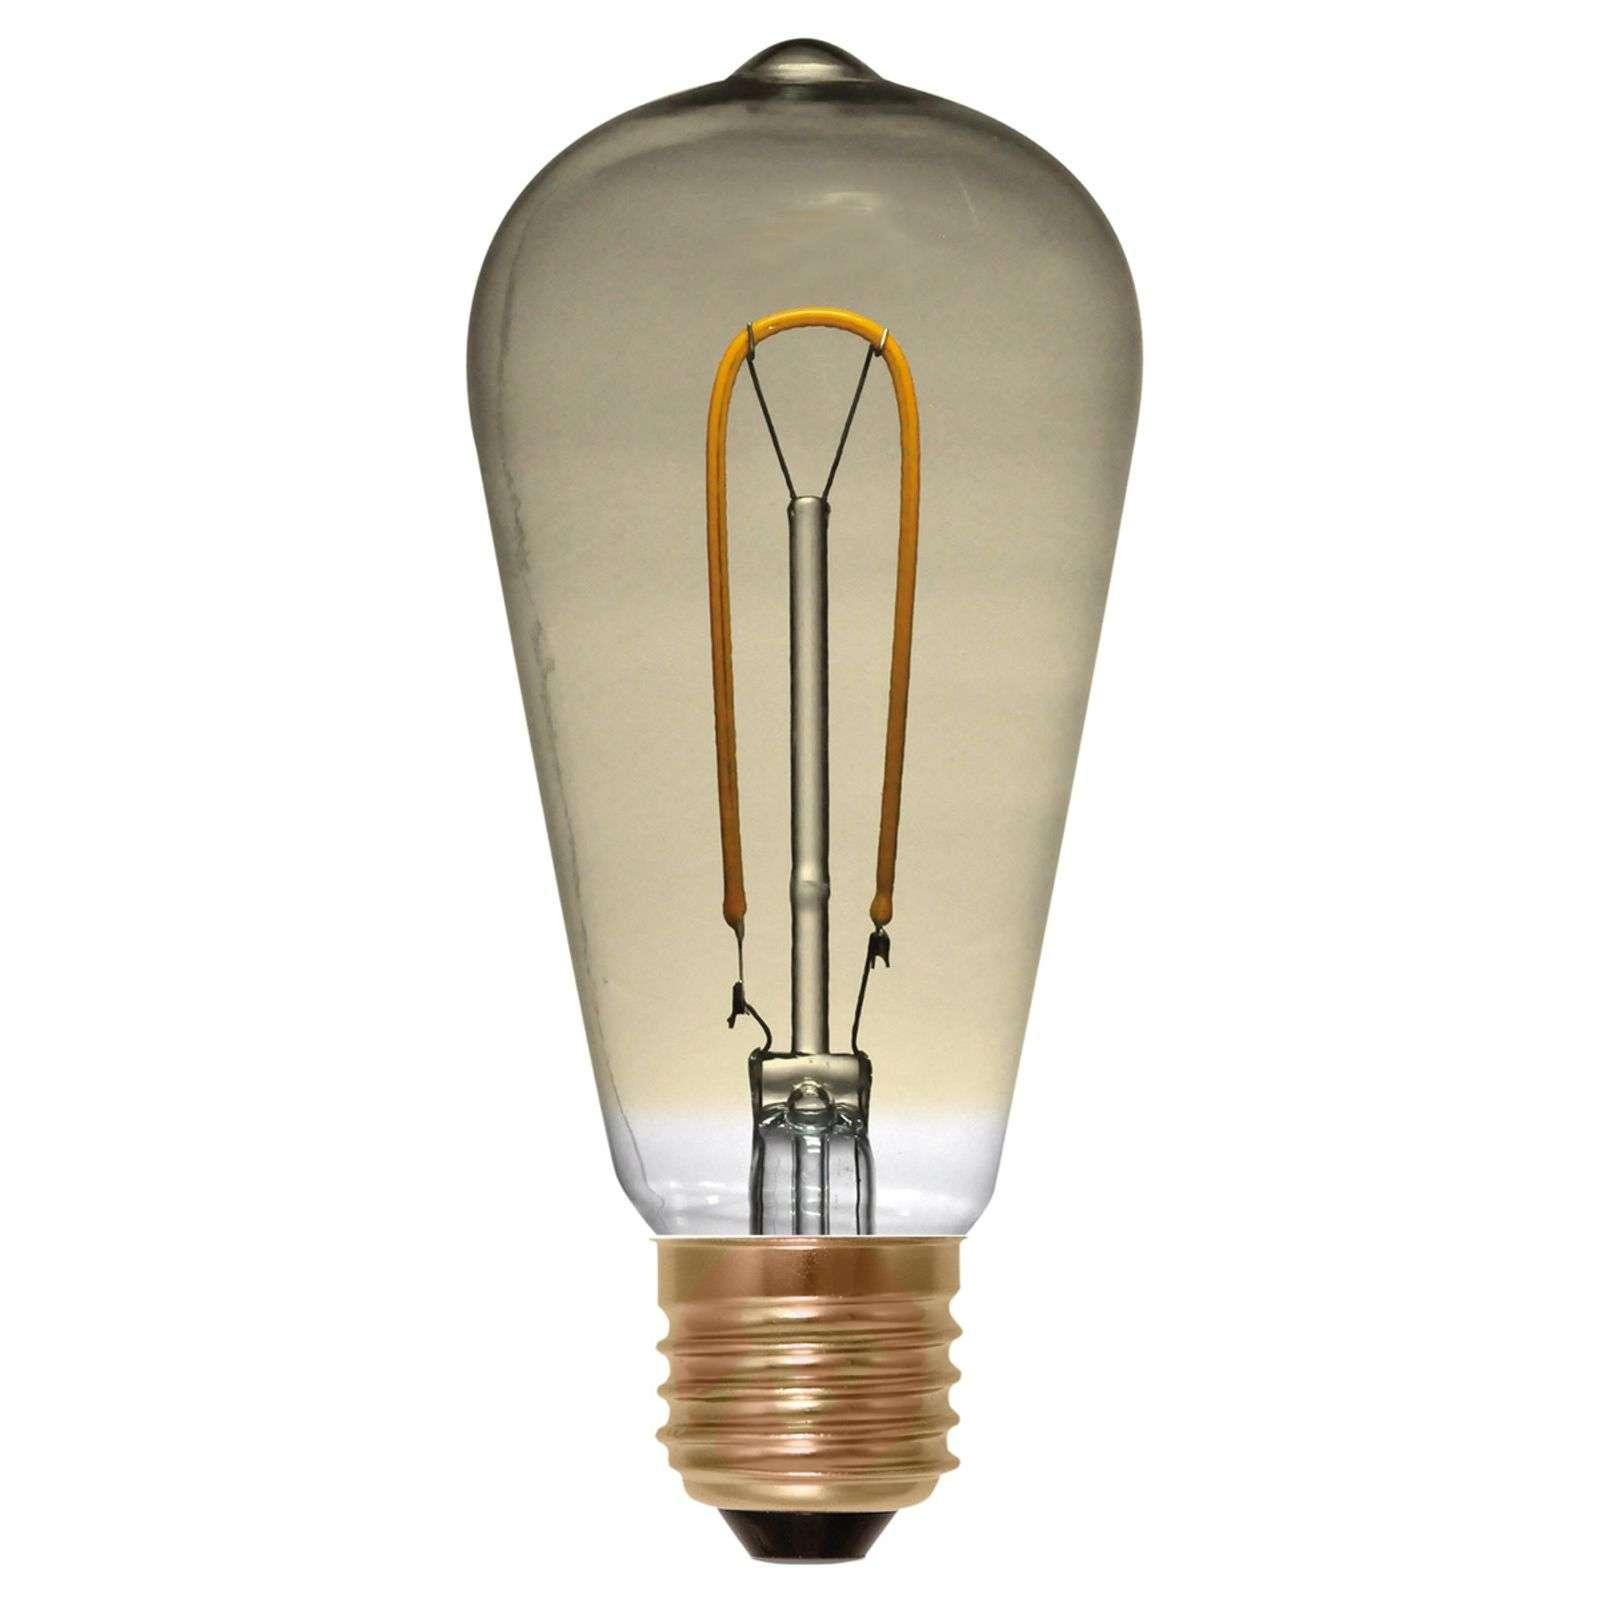 Rustiikkinen LED-lamppu Curved Line E27 2,7W 922-8536164-02